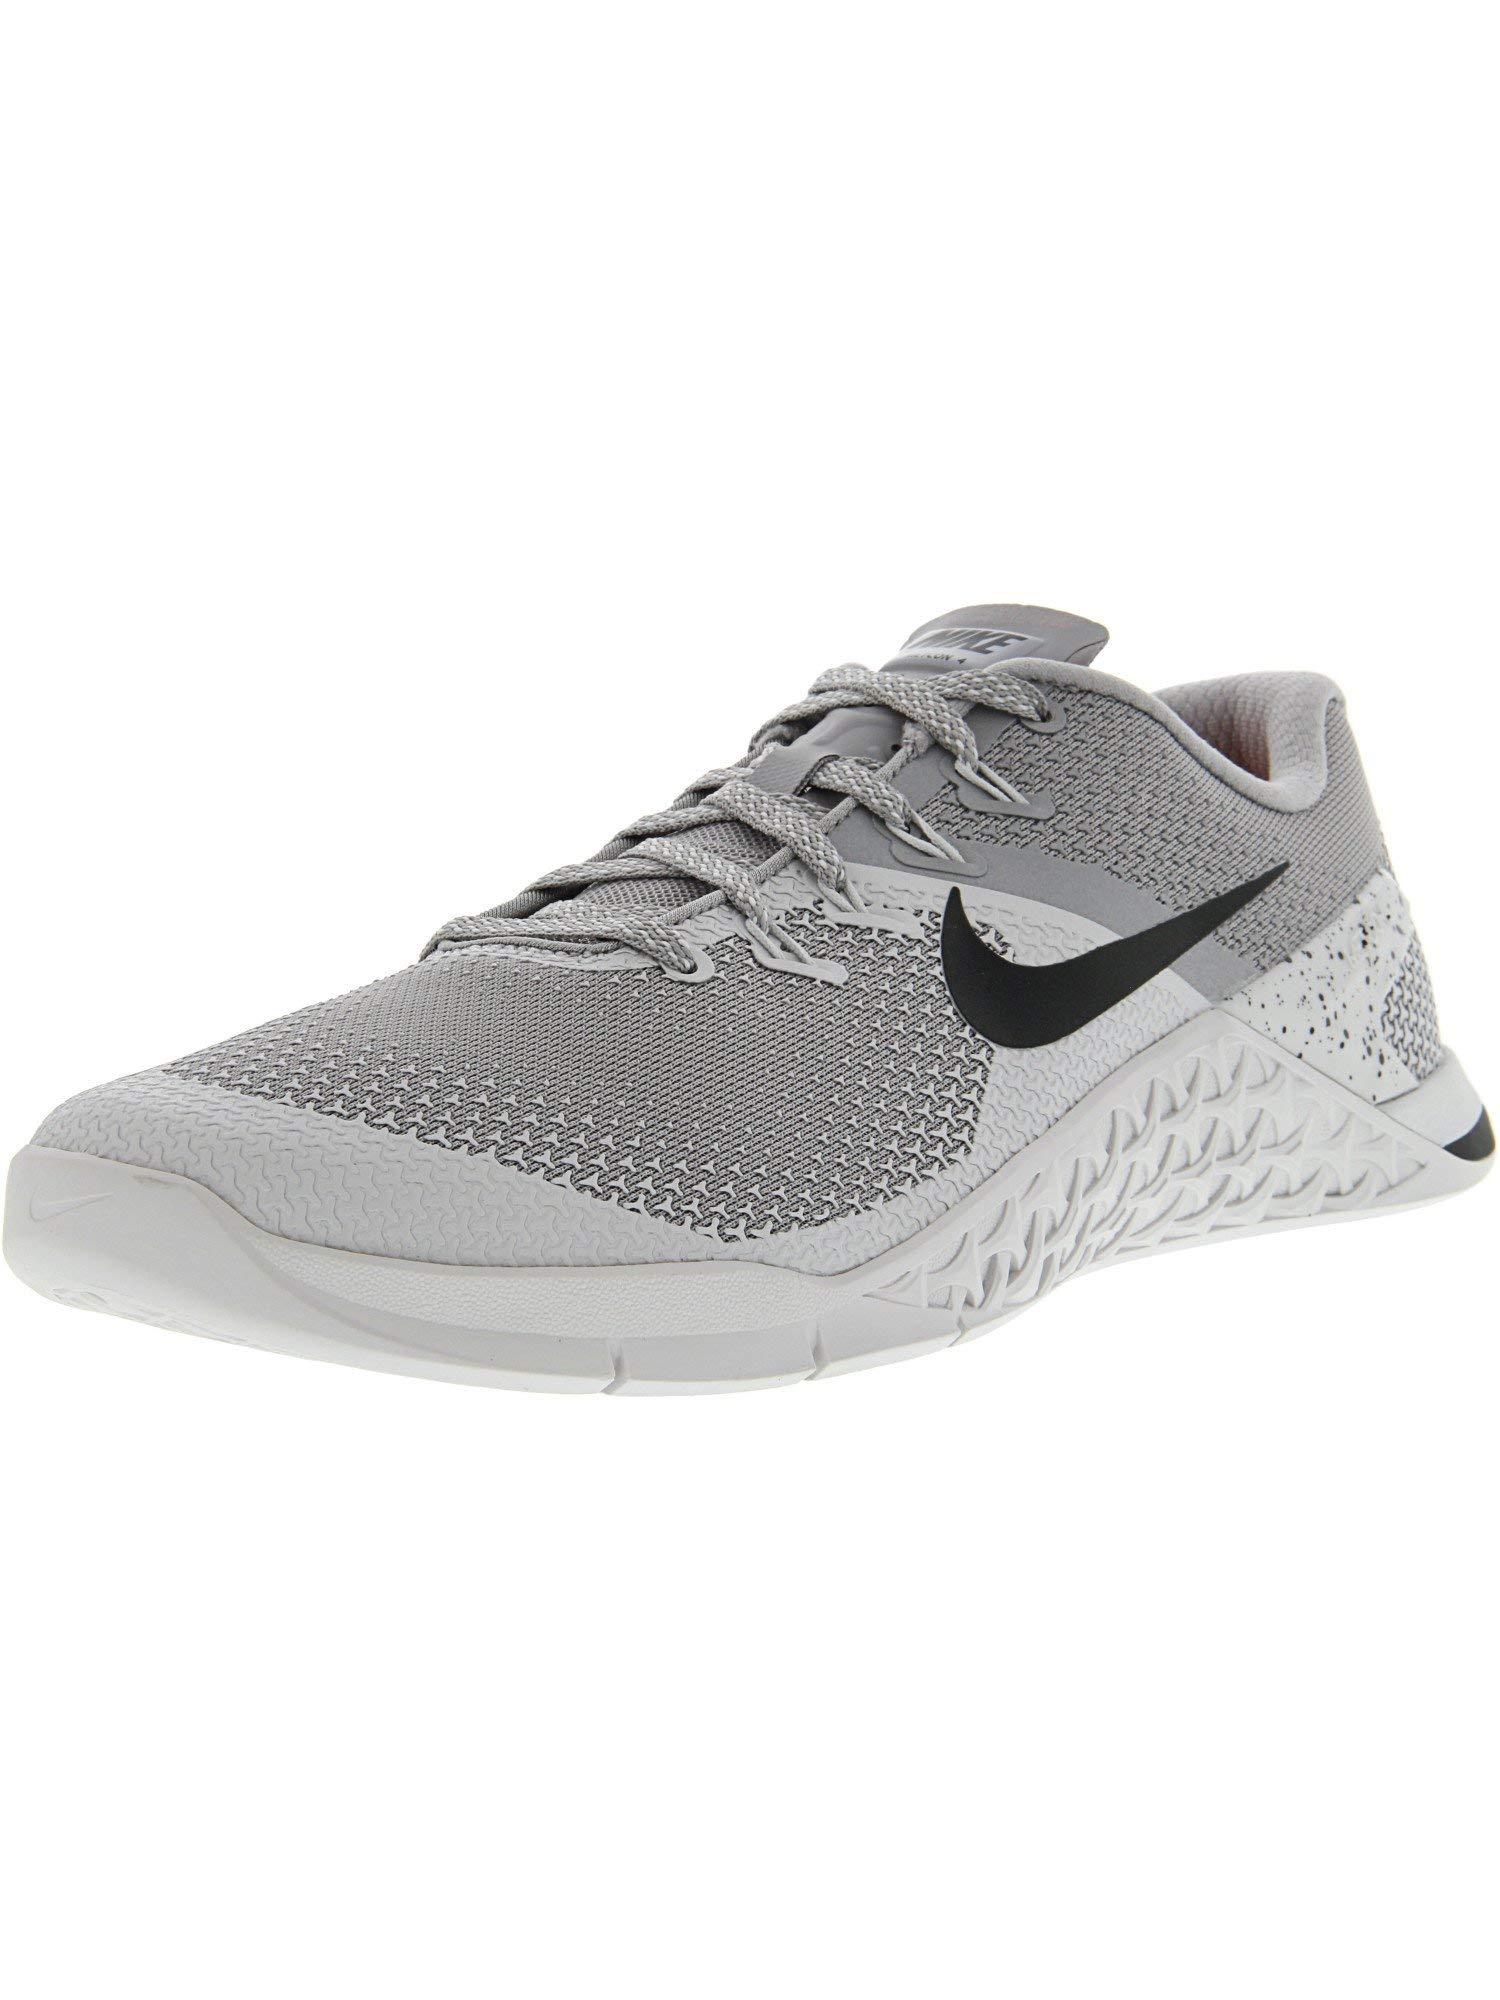 Nike Men's Metcon 4 Atmosphere Grey/Black Ankle-High Cross Trainer Shoe - 7M by Nike (Image #1)